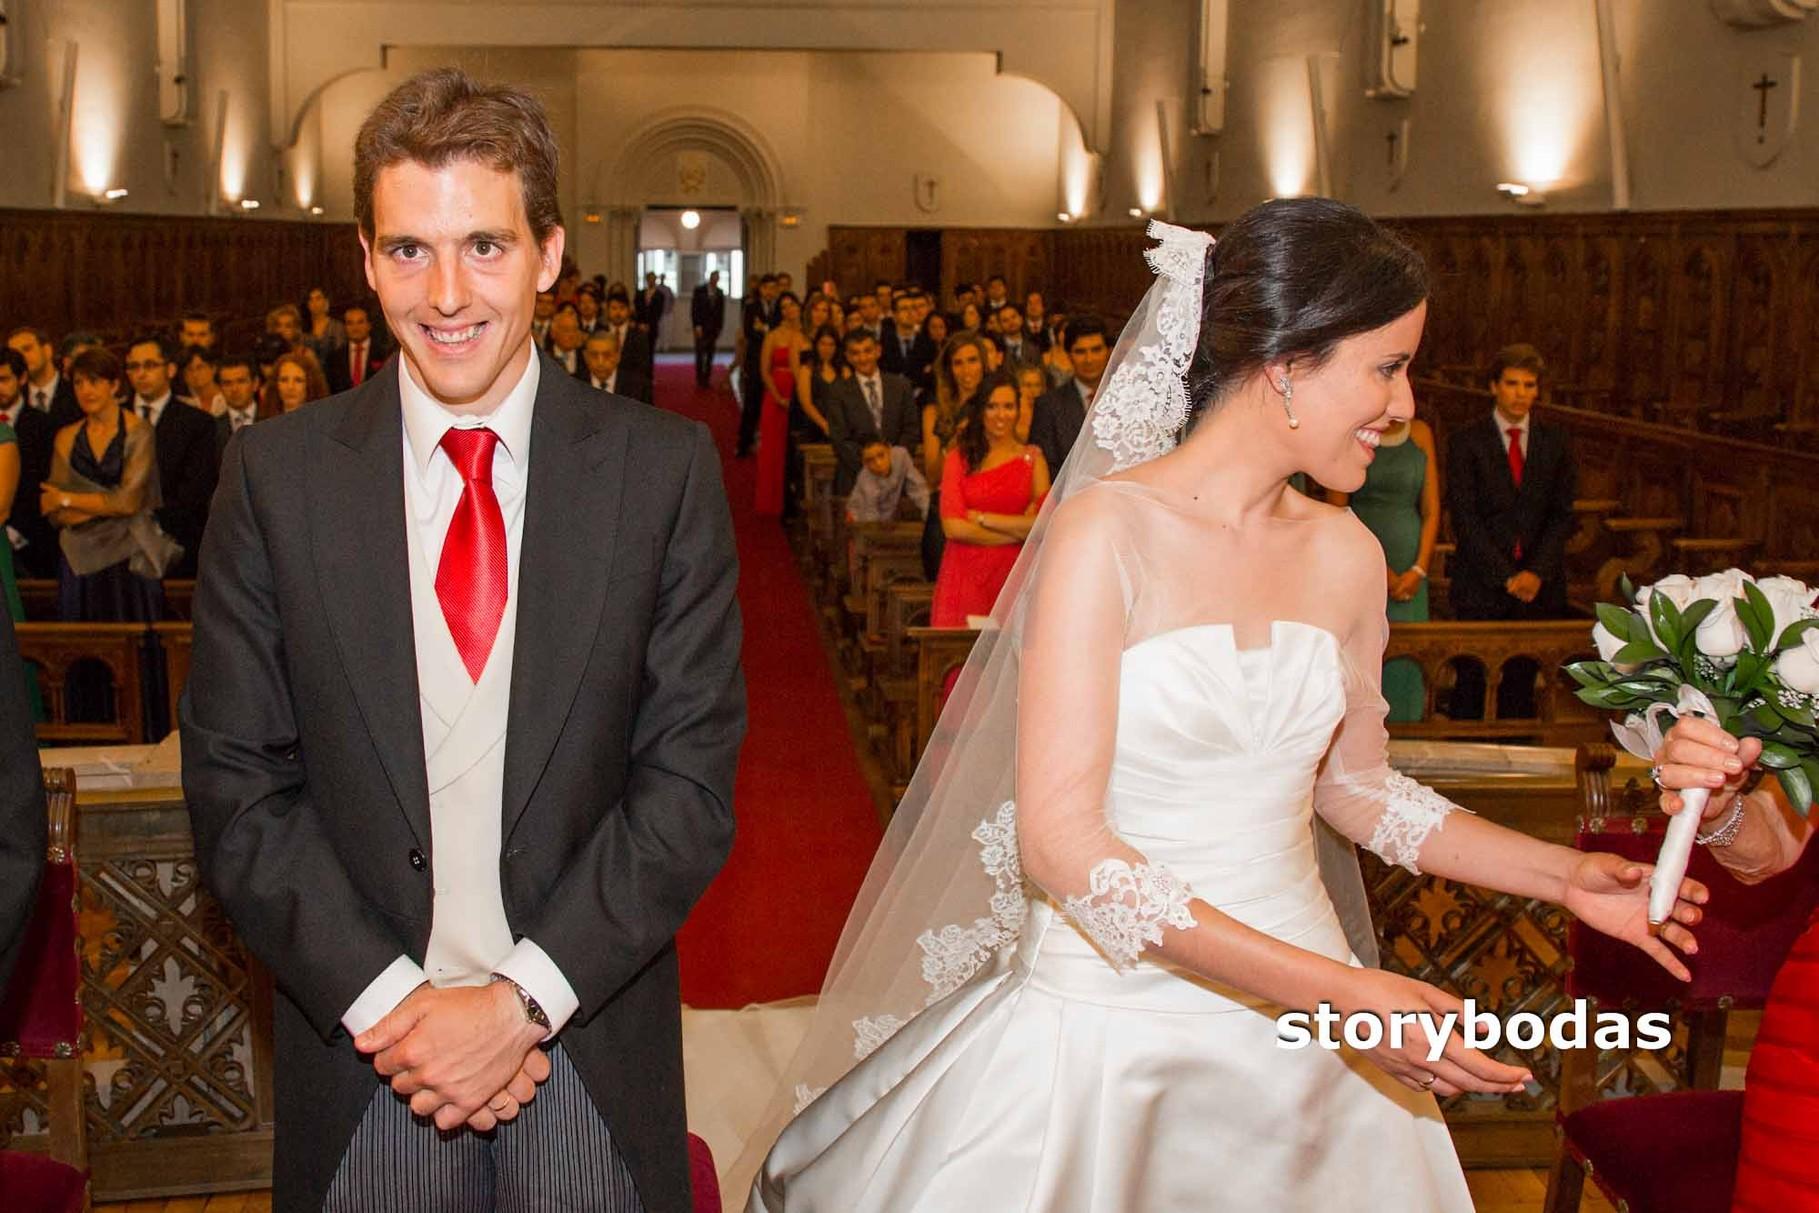 storybodas Rito del Matrimonio arras 2